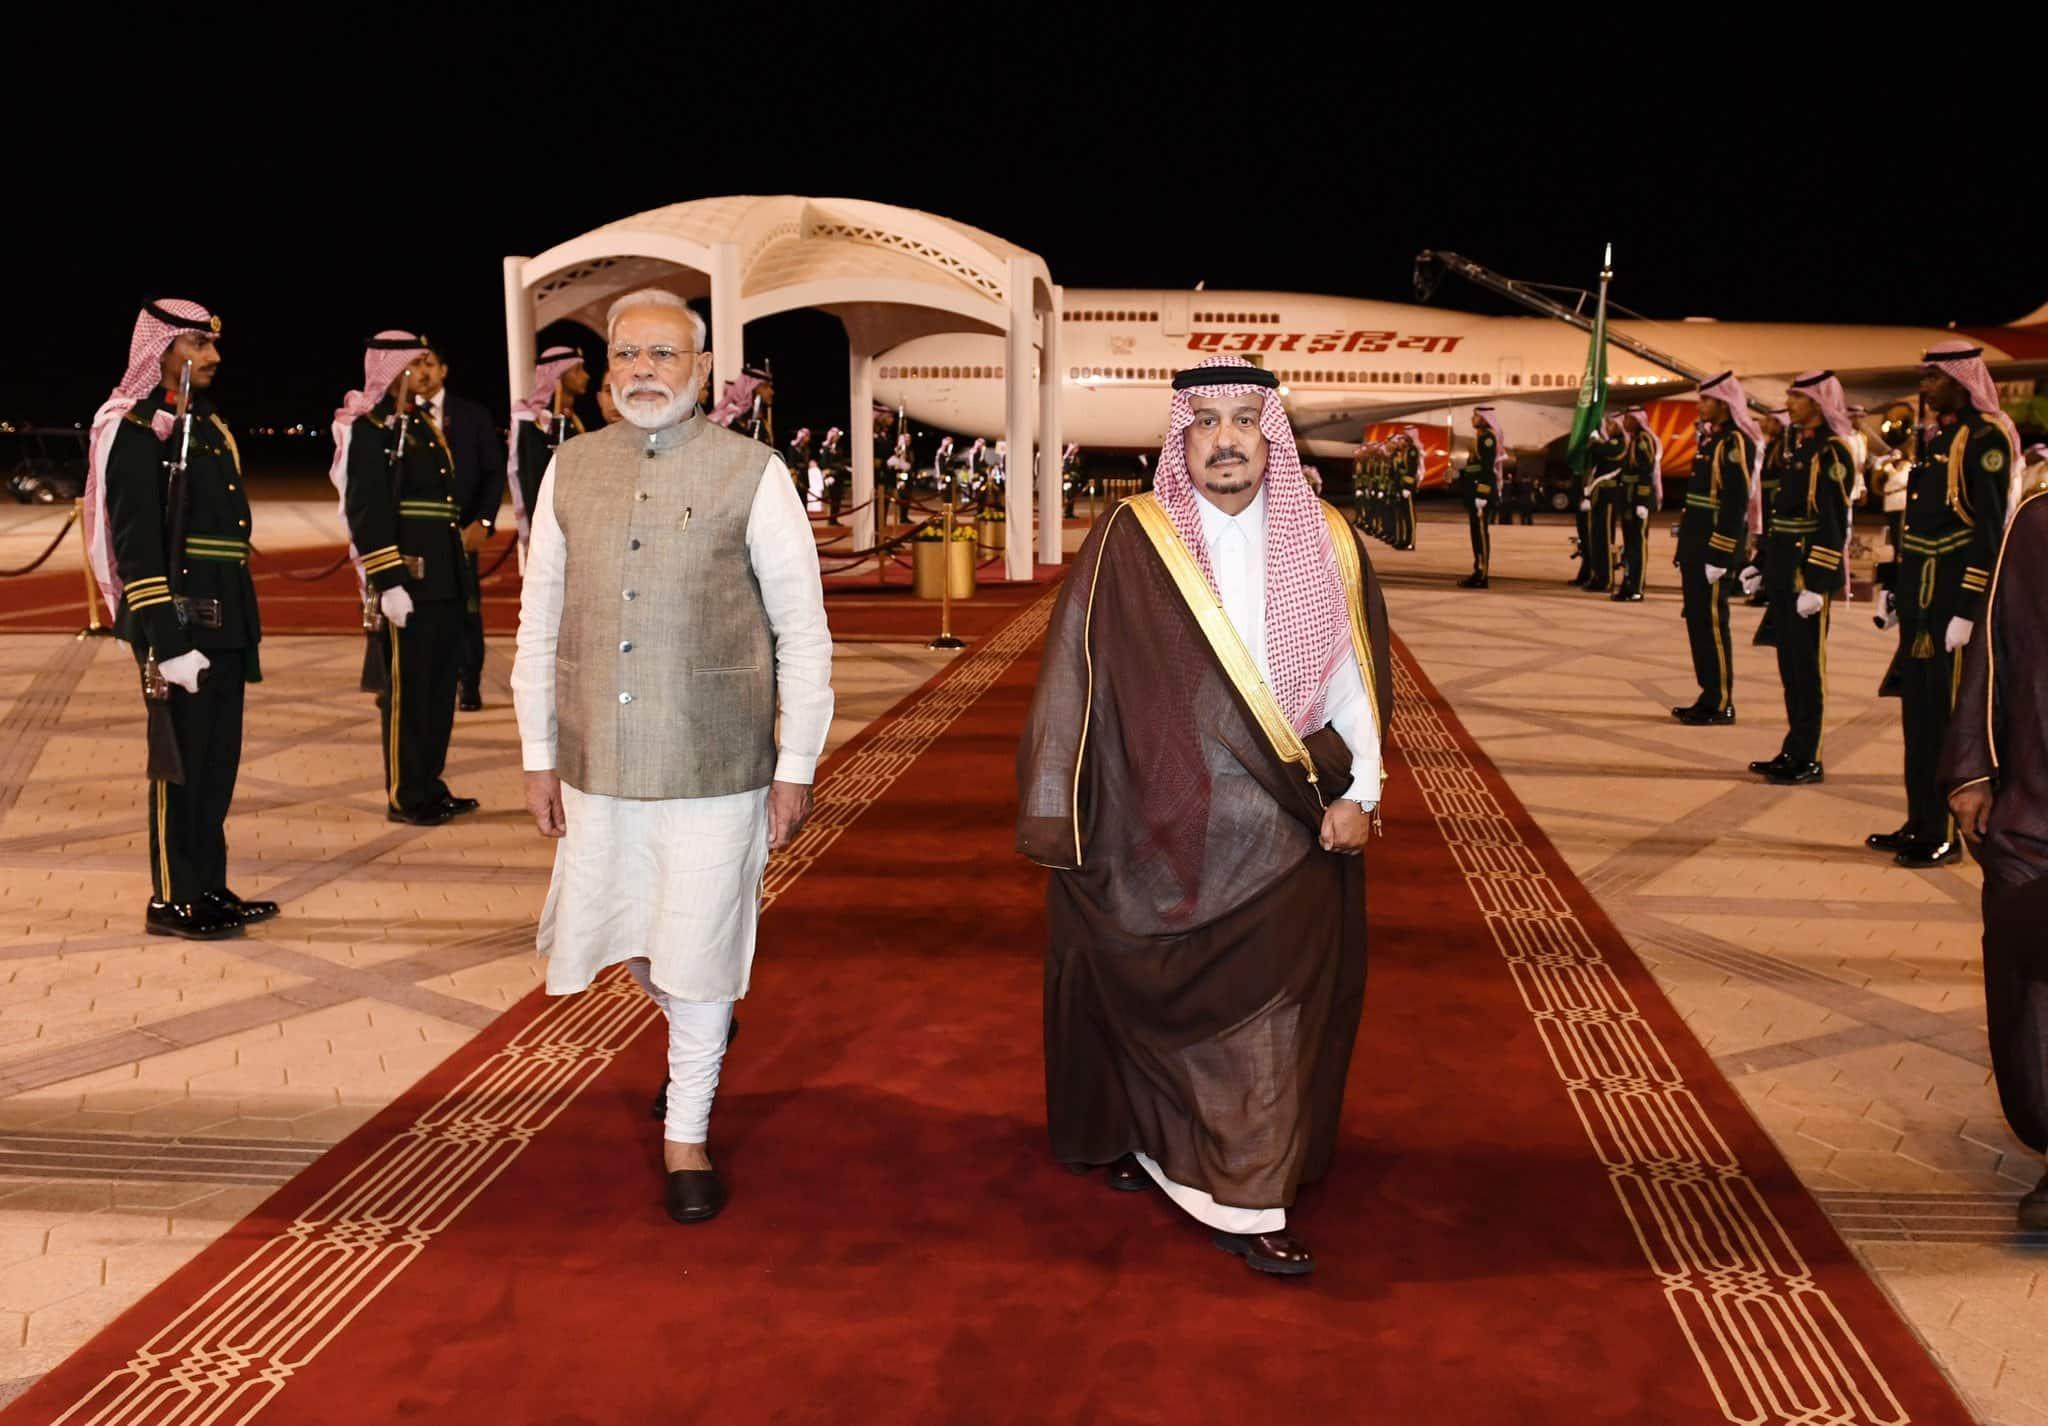 India and Saudi Arabia share similar security concerns in neighbourhood, says PM Narendra Modi